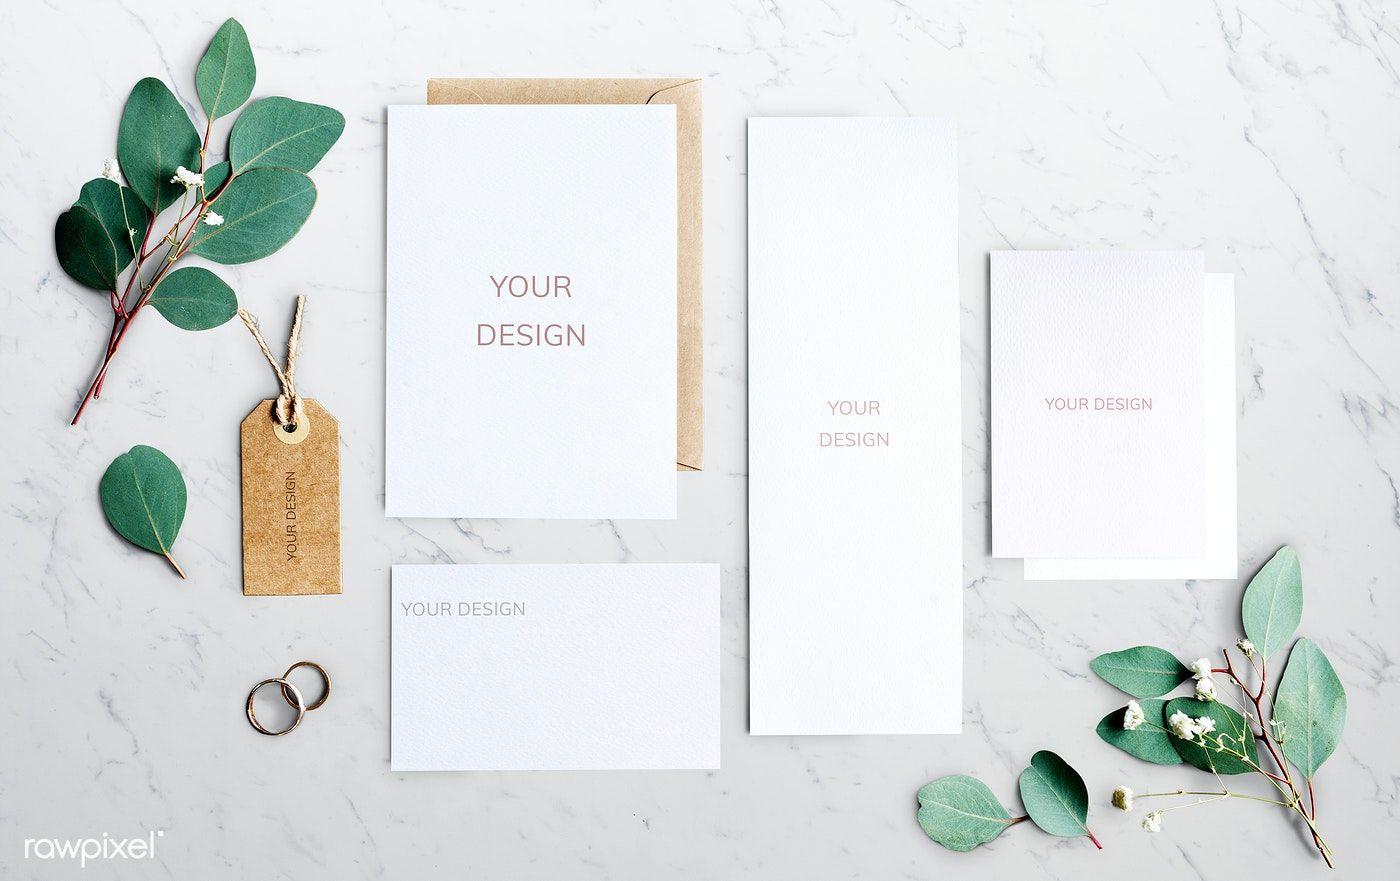 Download Premium Psd Of Flatlay Of An Empty Wedding Invitation